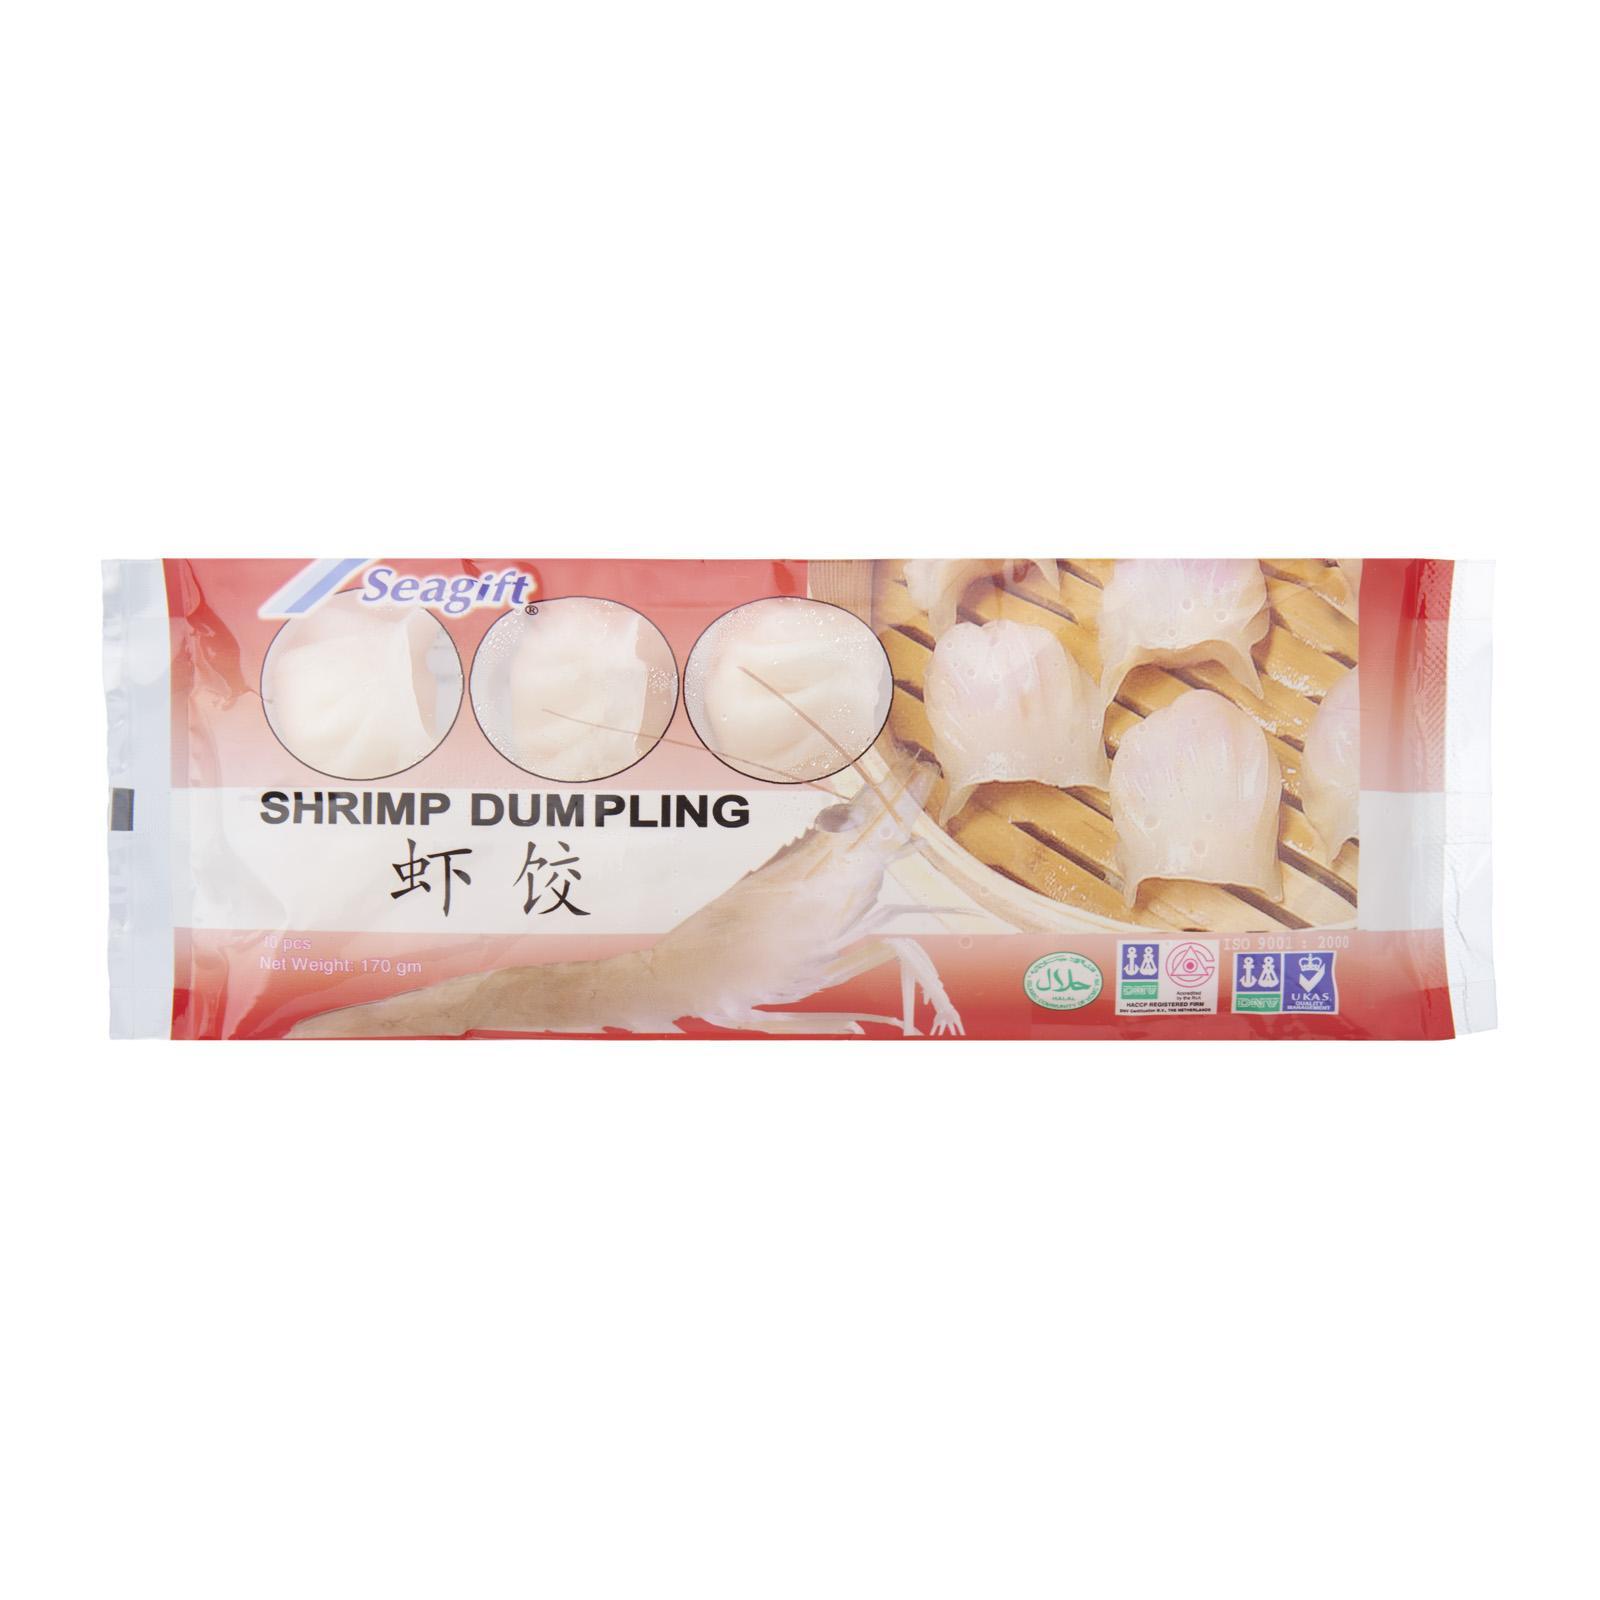 Seagift Shrimp Dumpling - Frozen